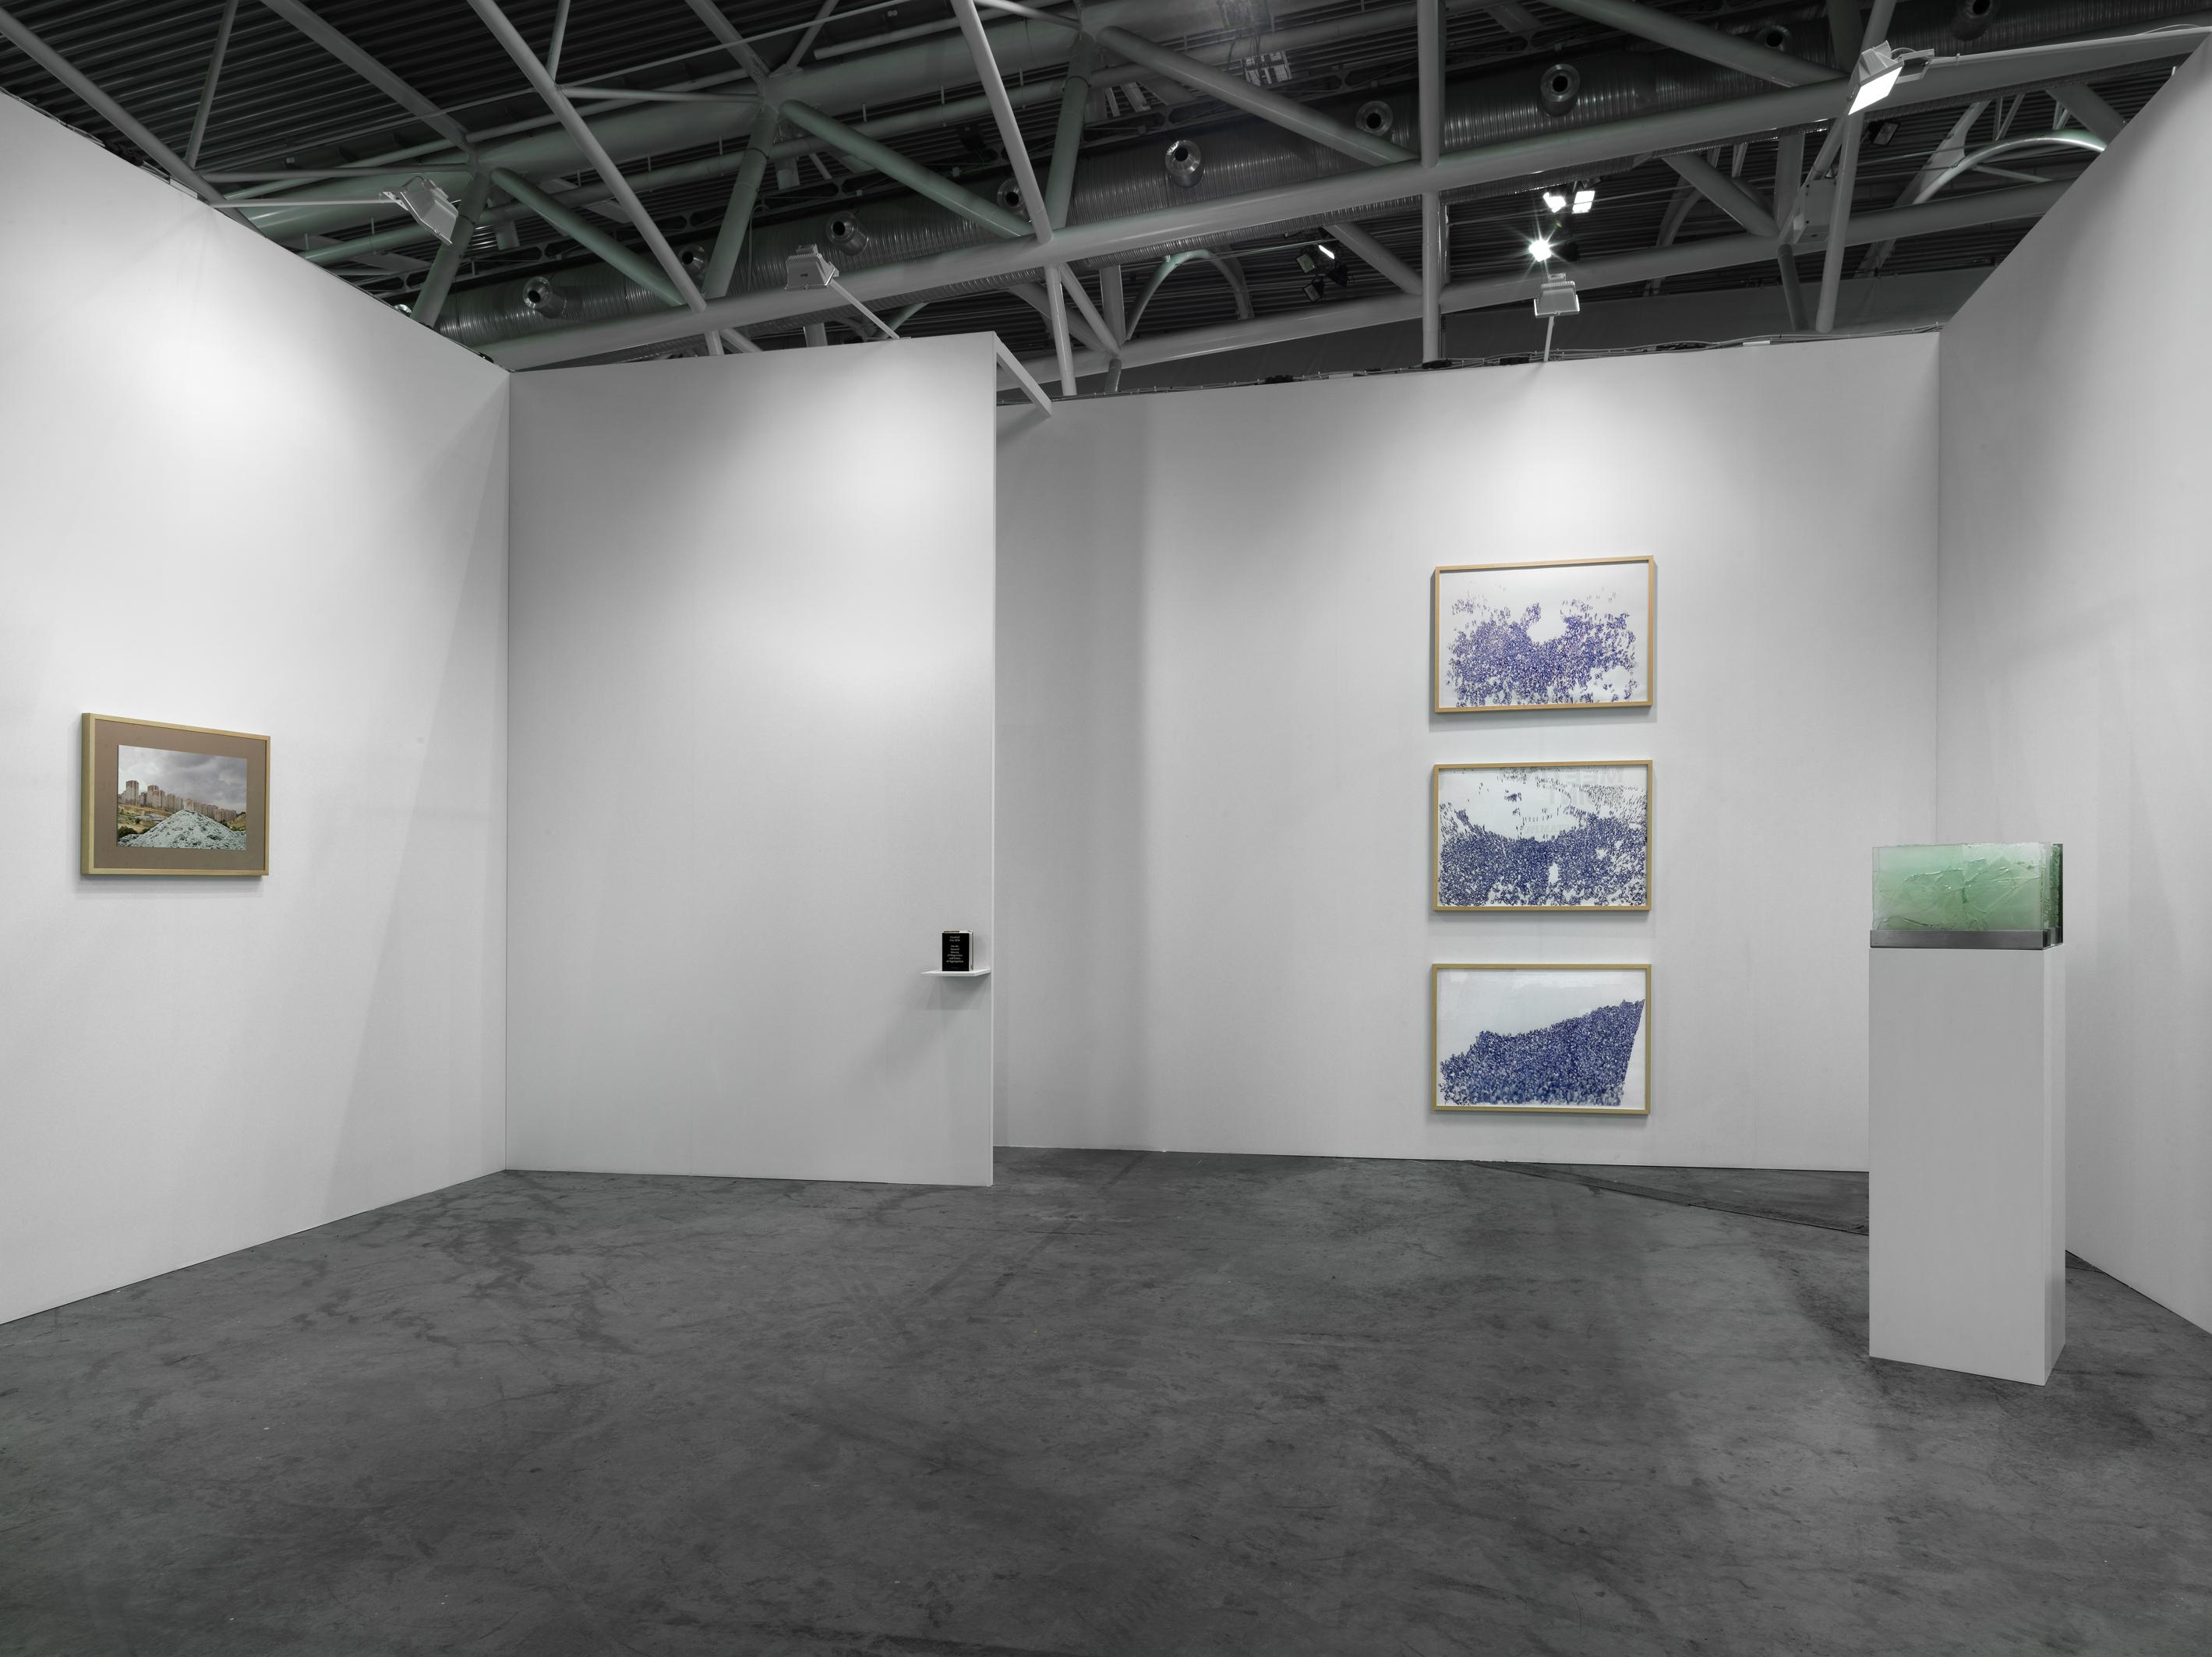 ARTISSIMA 2014